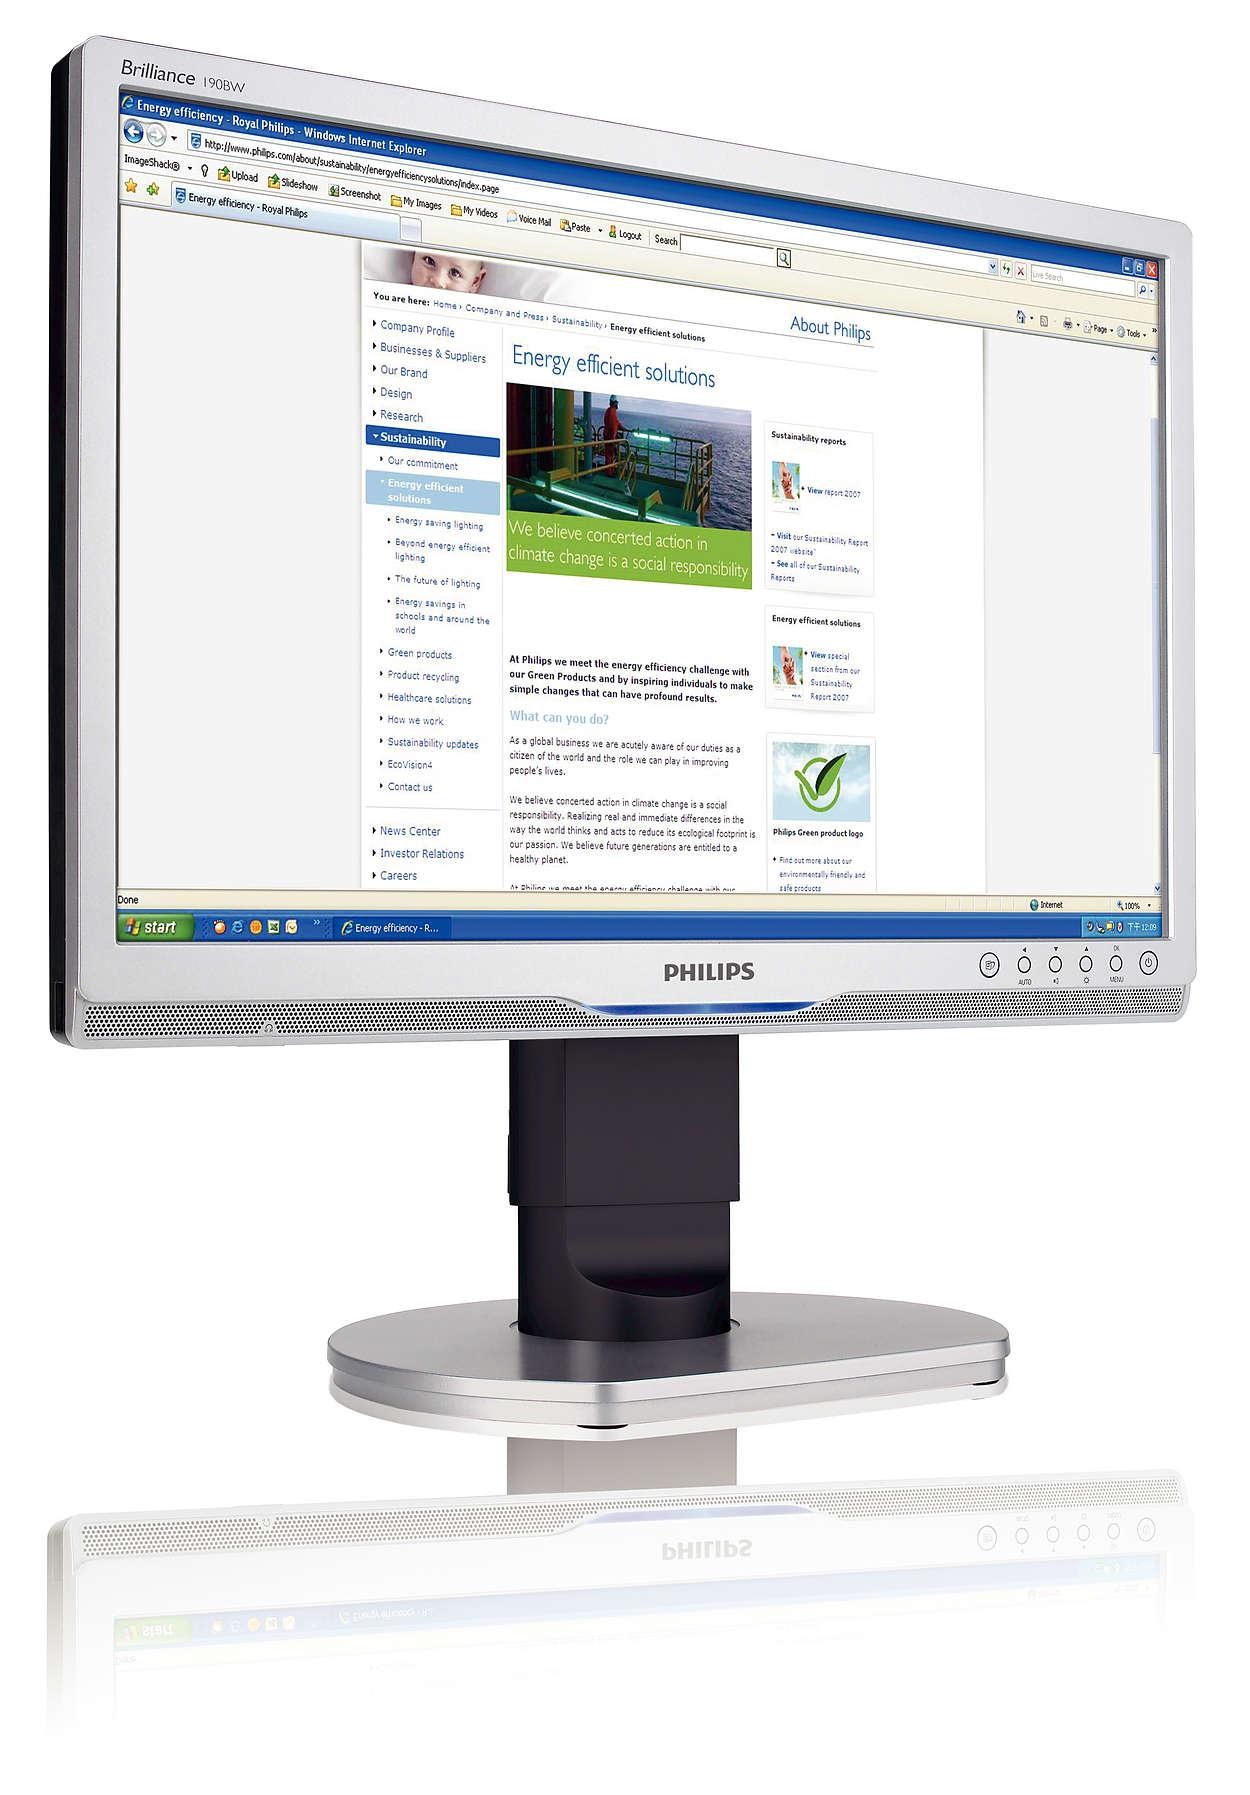 High resolution ergonomic widescreen for business